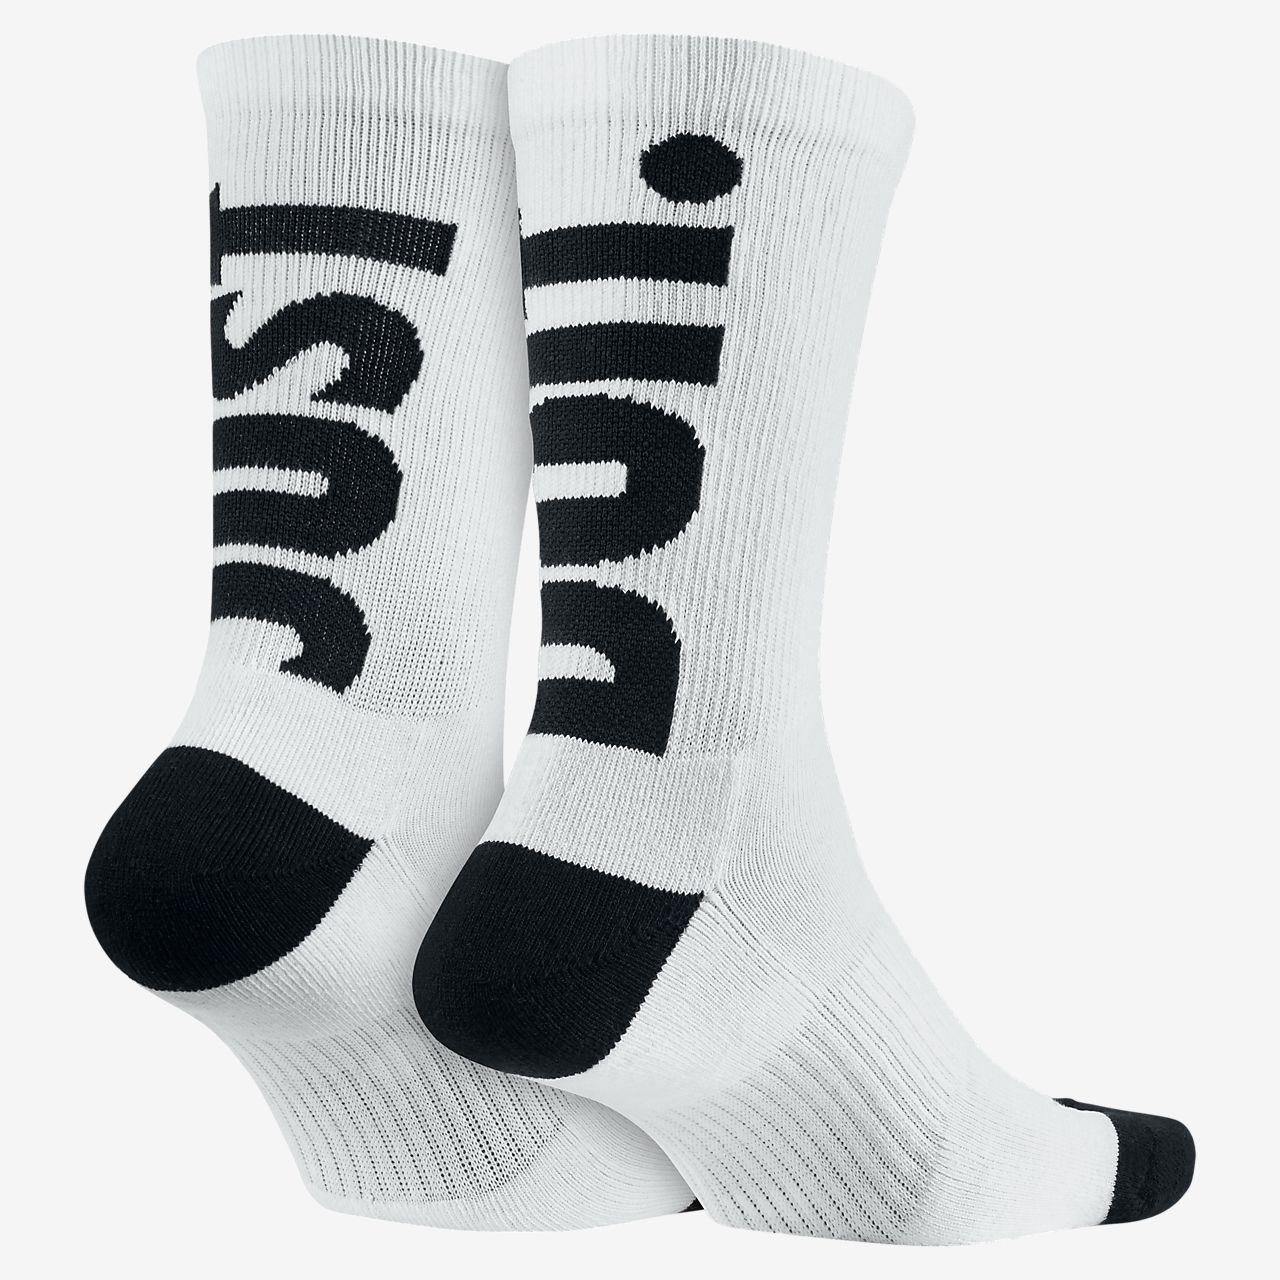 nike just do it crew socks 2 pair nikecom bg